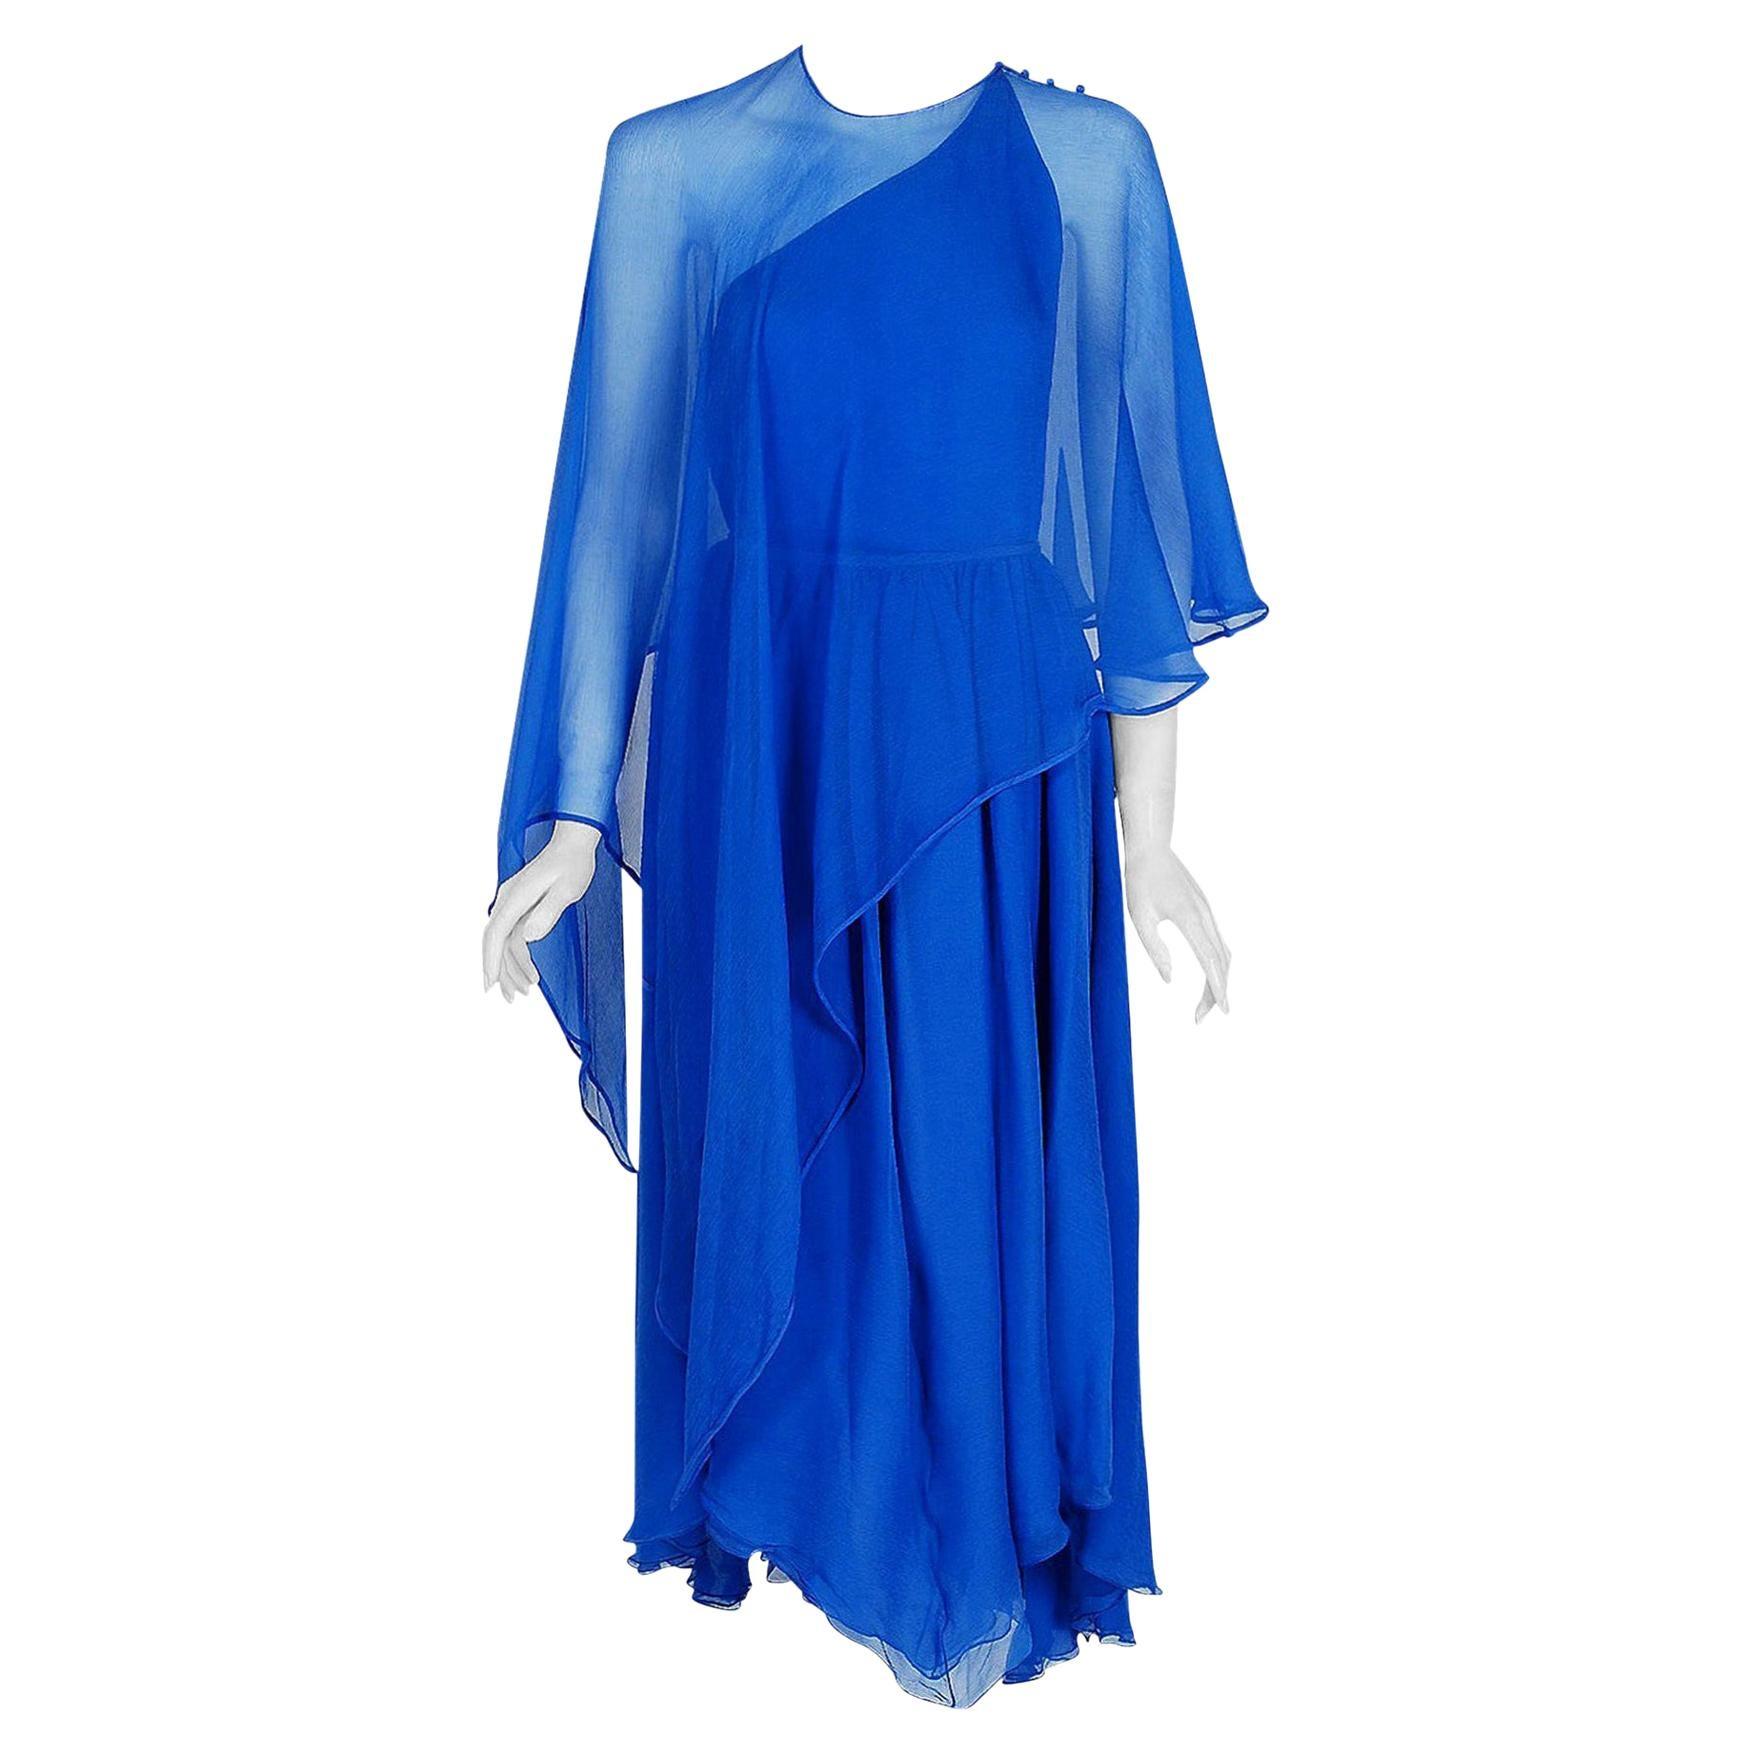 Vintage 1970's Oscar de la Renta Royal-Blue Silk Asymmetric Caftan Dress Set